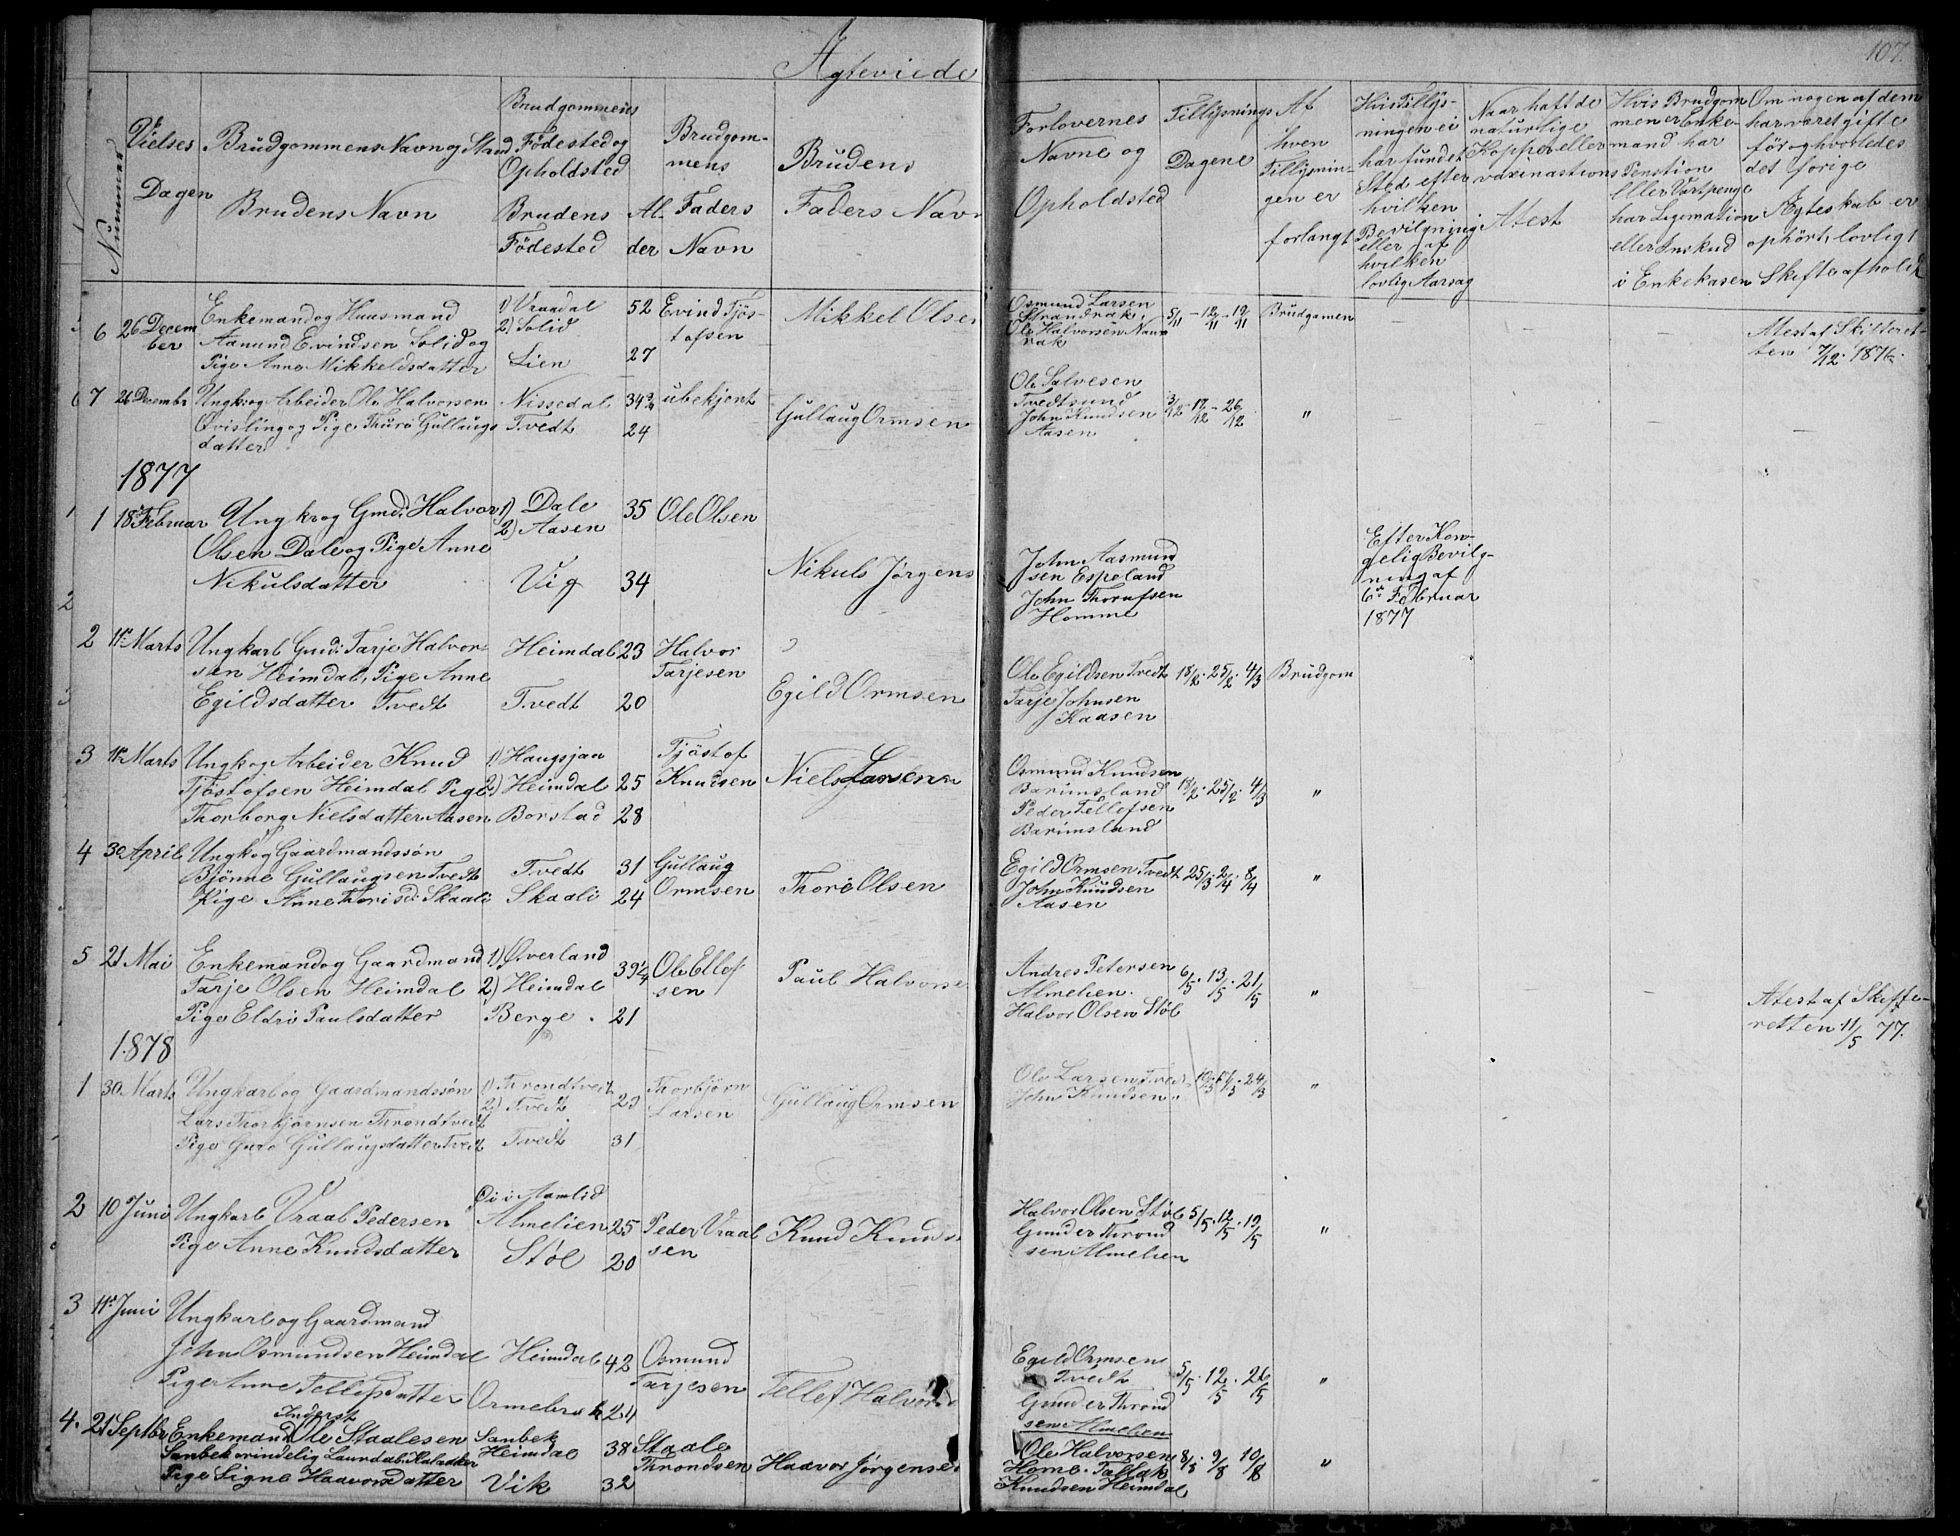 SAKO, Nissedal kirkebøker, G/Gb/L0002: Klokkerbok nr. II 2, 1863-1892, s. 107